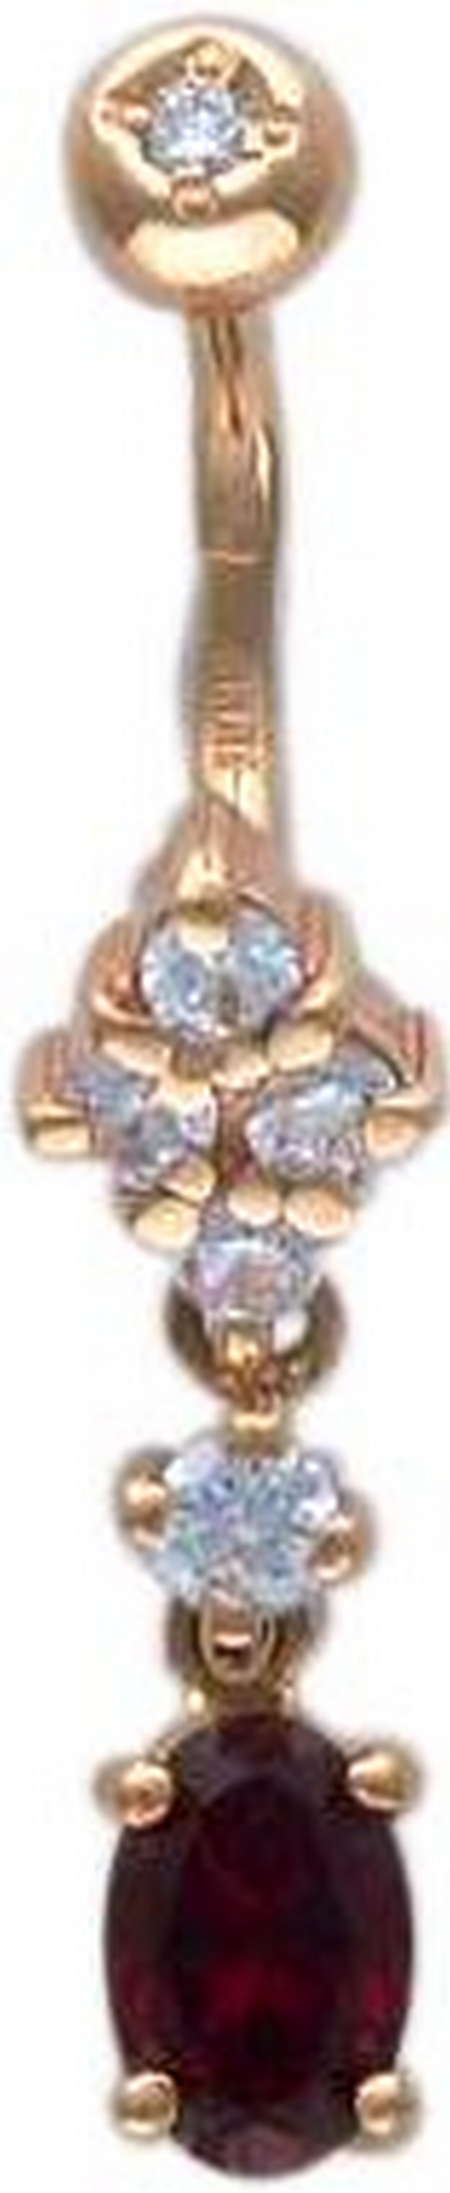 Пирсинг из золота с фианитами 01И210042